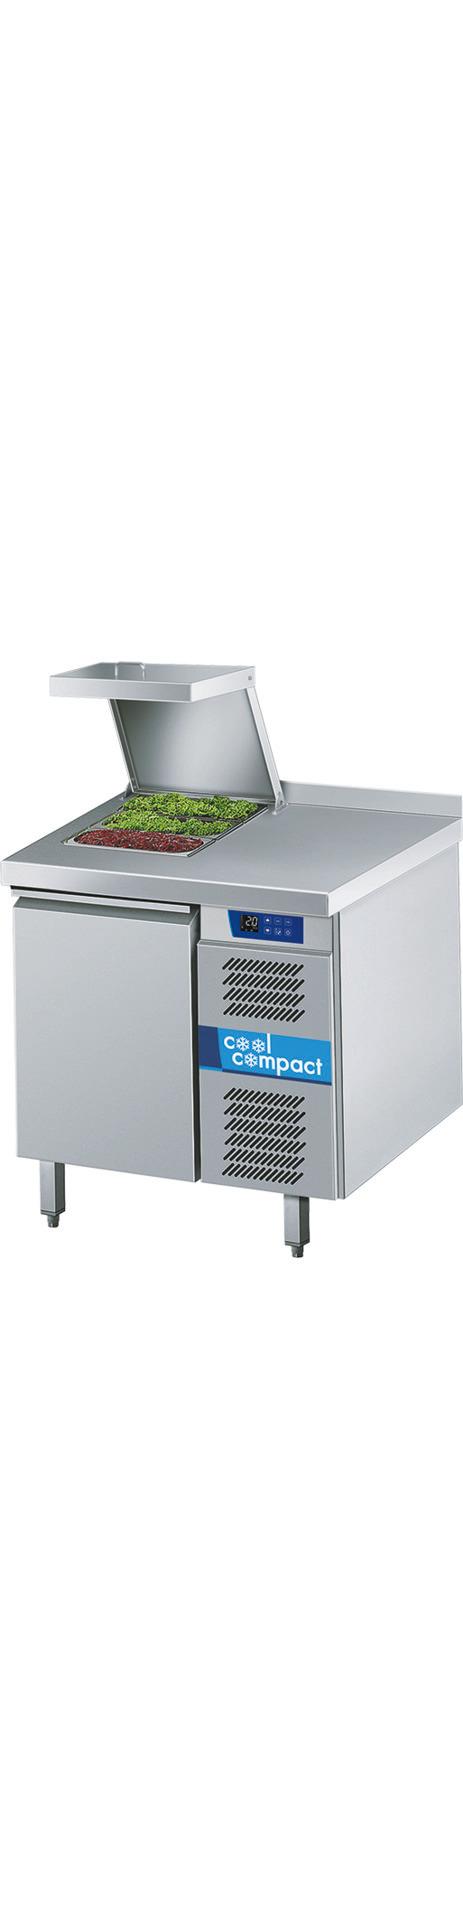 Saladette 1 Tür je 10 x GN 1/1 /  mit Aufkantung hinten / zentralgekühlt